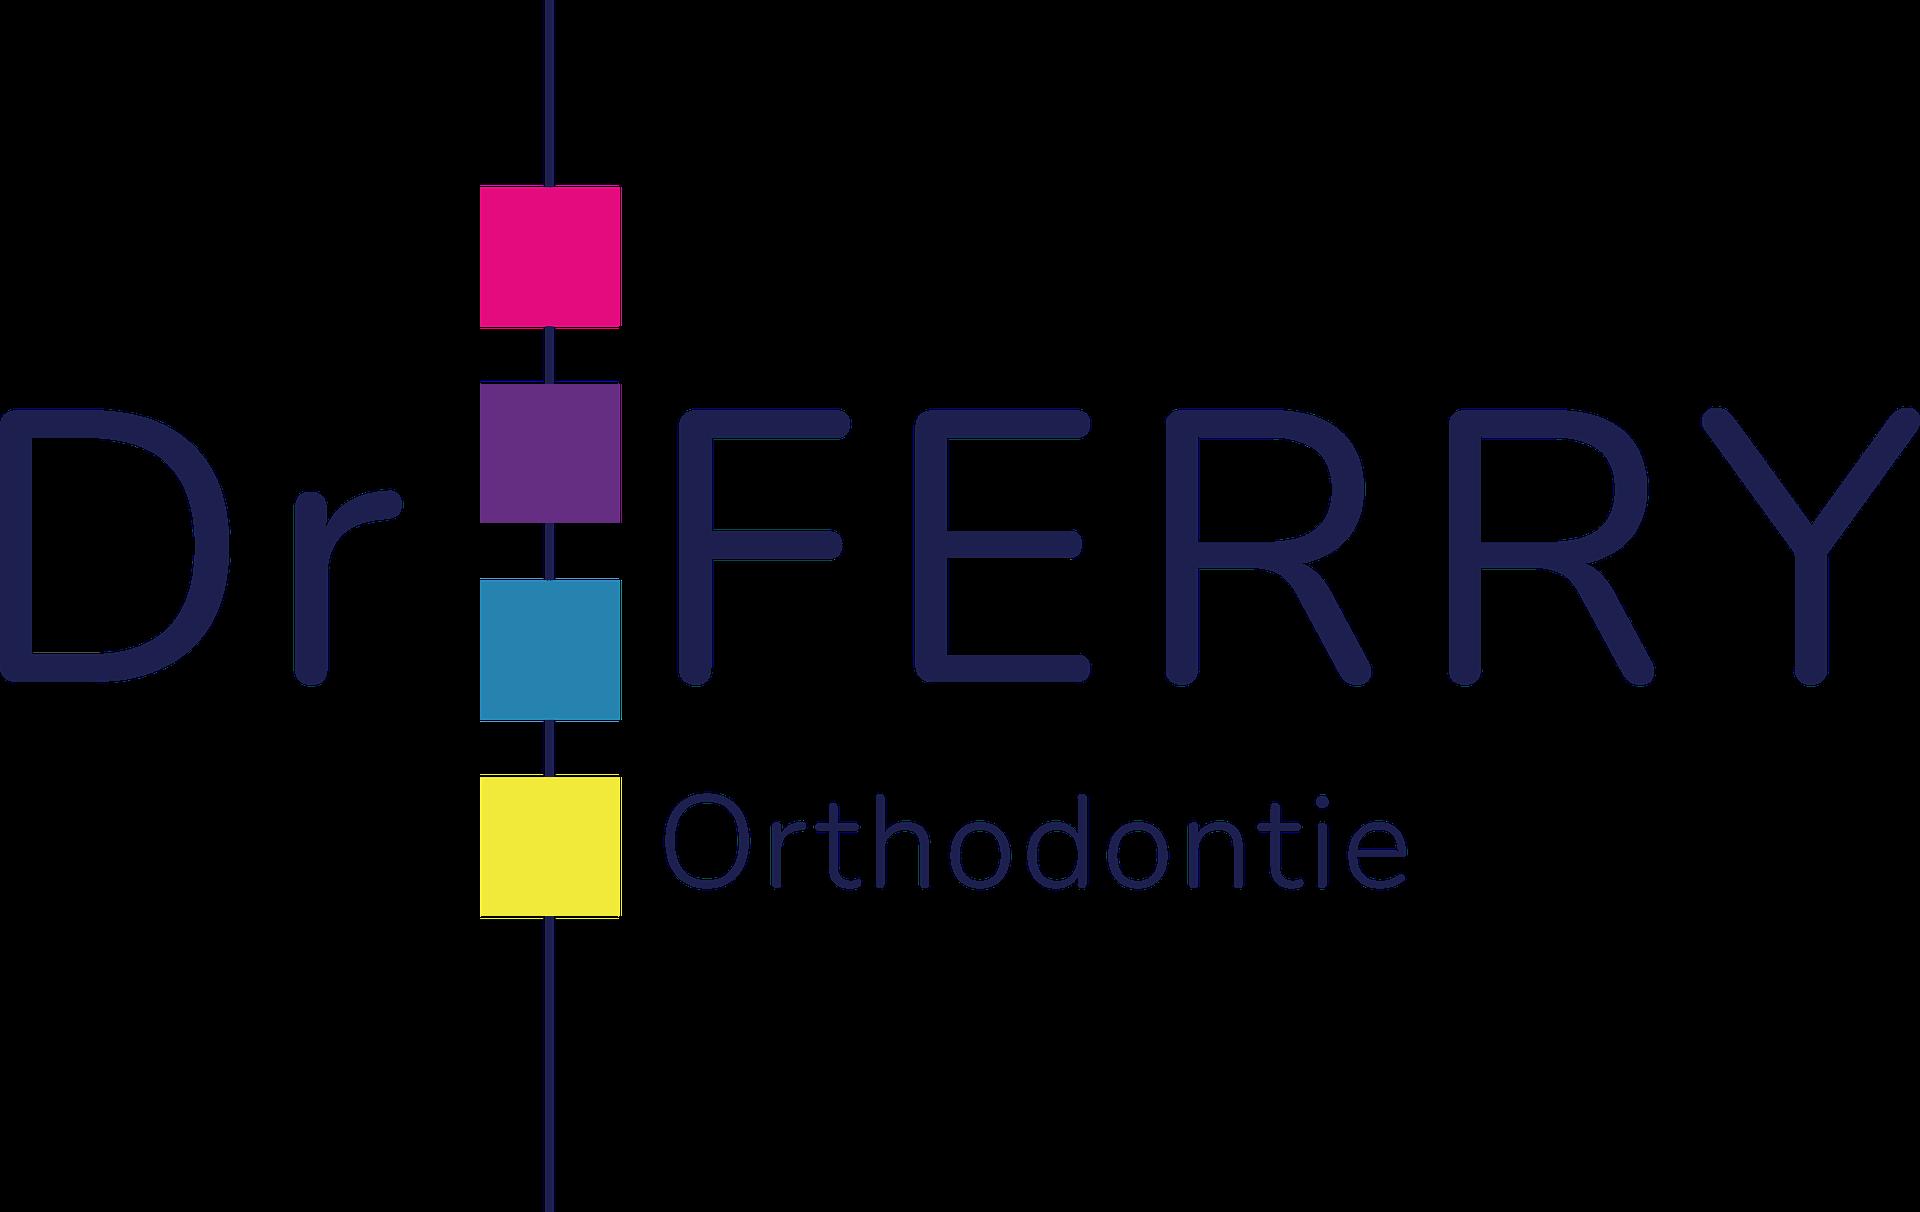 Cabinet d'orthodontie du Dr Ferry - Tarare